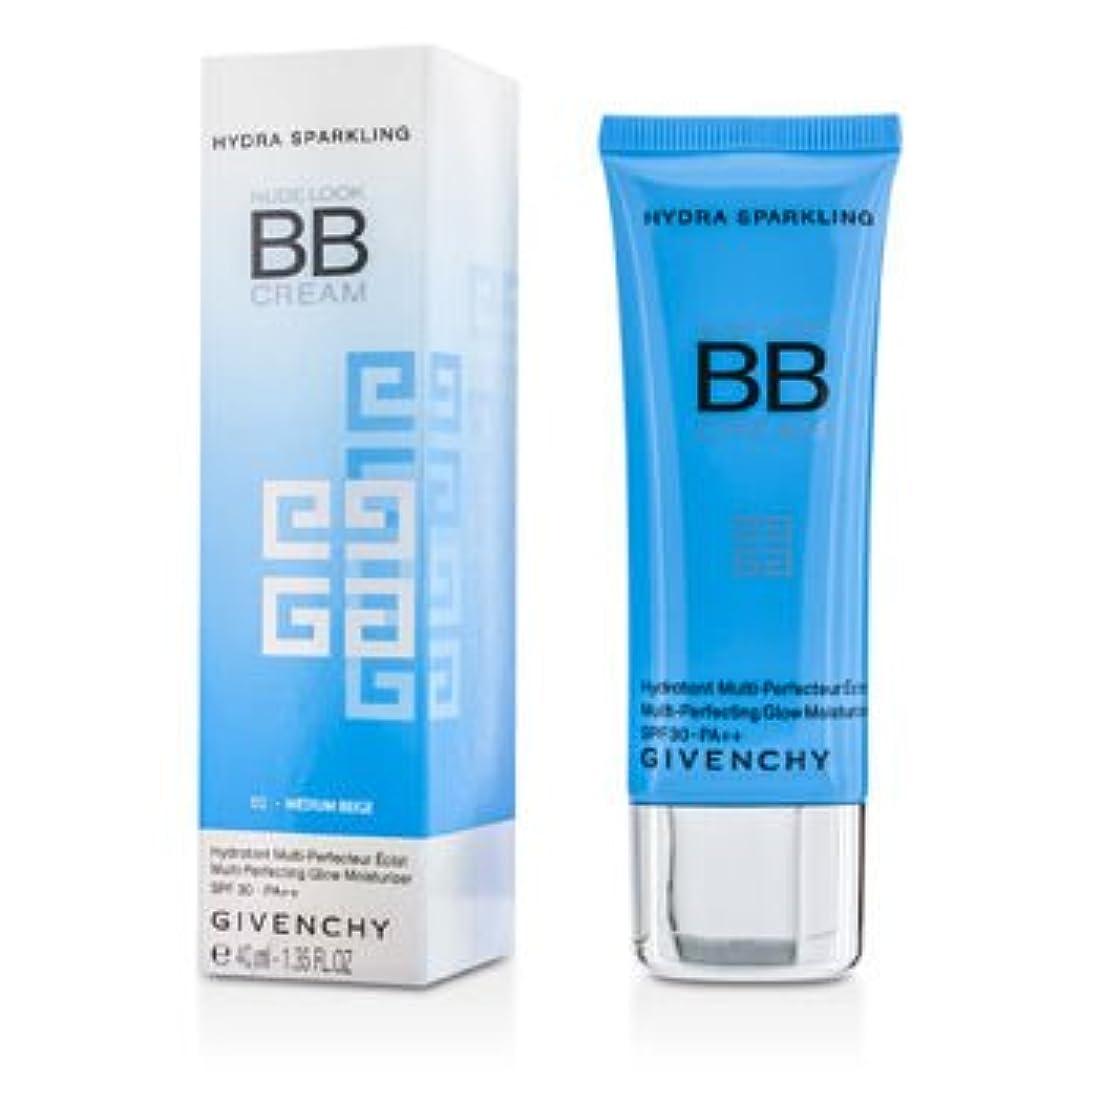 無限病巨人[Givenchy] Nude Look BB Cream Multi-Perfecting Glow Moisturizer SPF 30 PA++ #02 Medium Beige 40ml/1.35oz